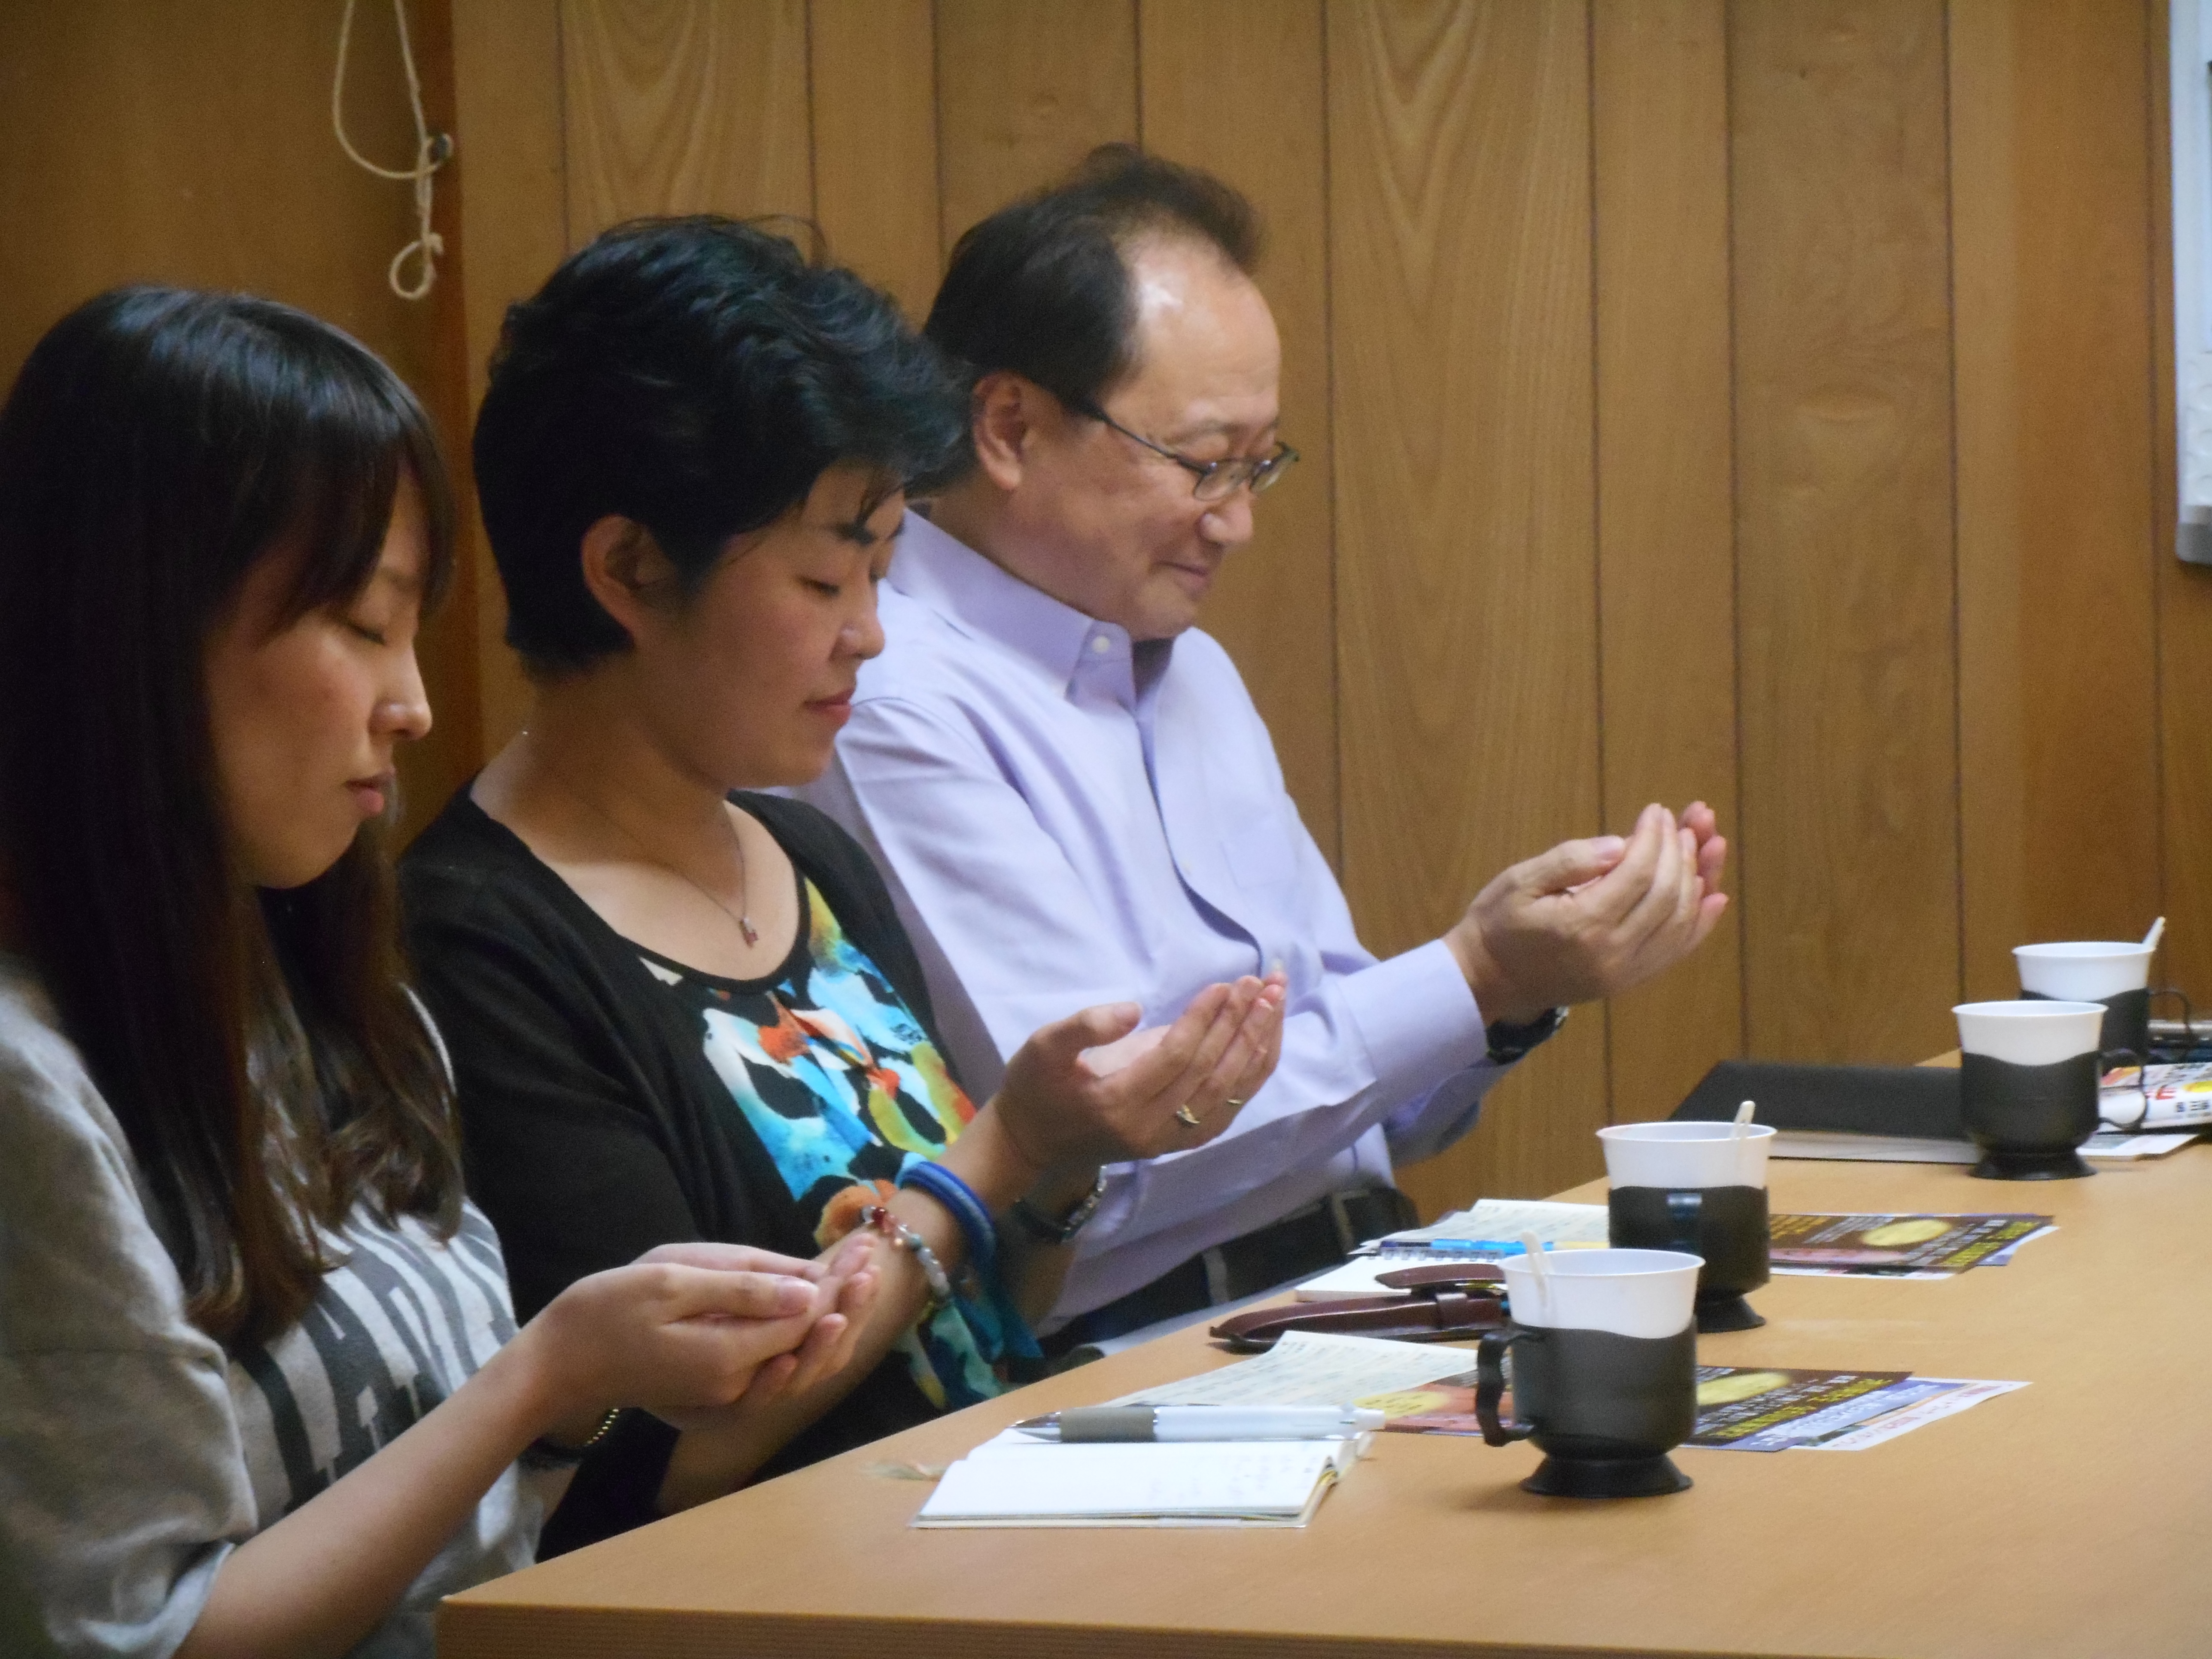 DSCN4883 - 池川先生から教えて頂いた令和の時代の生き方